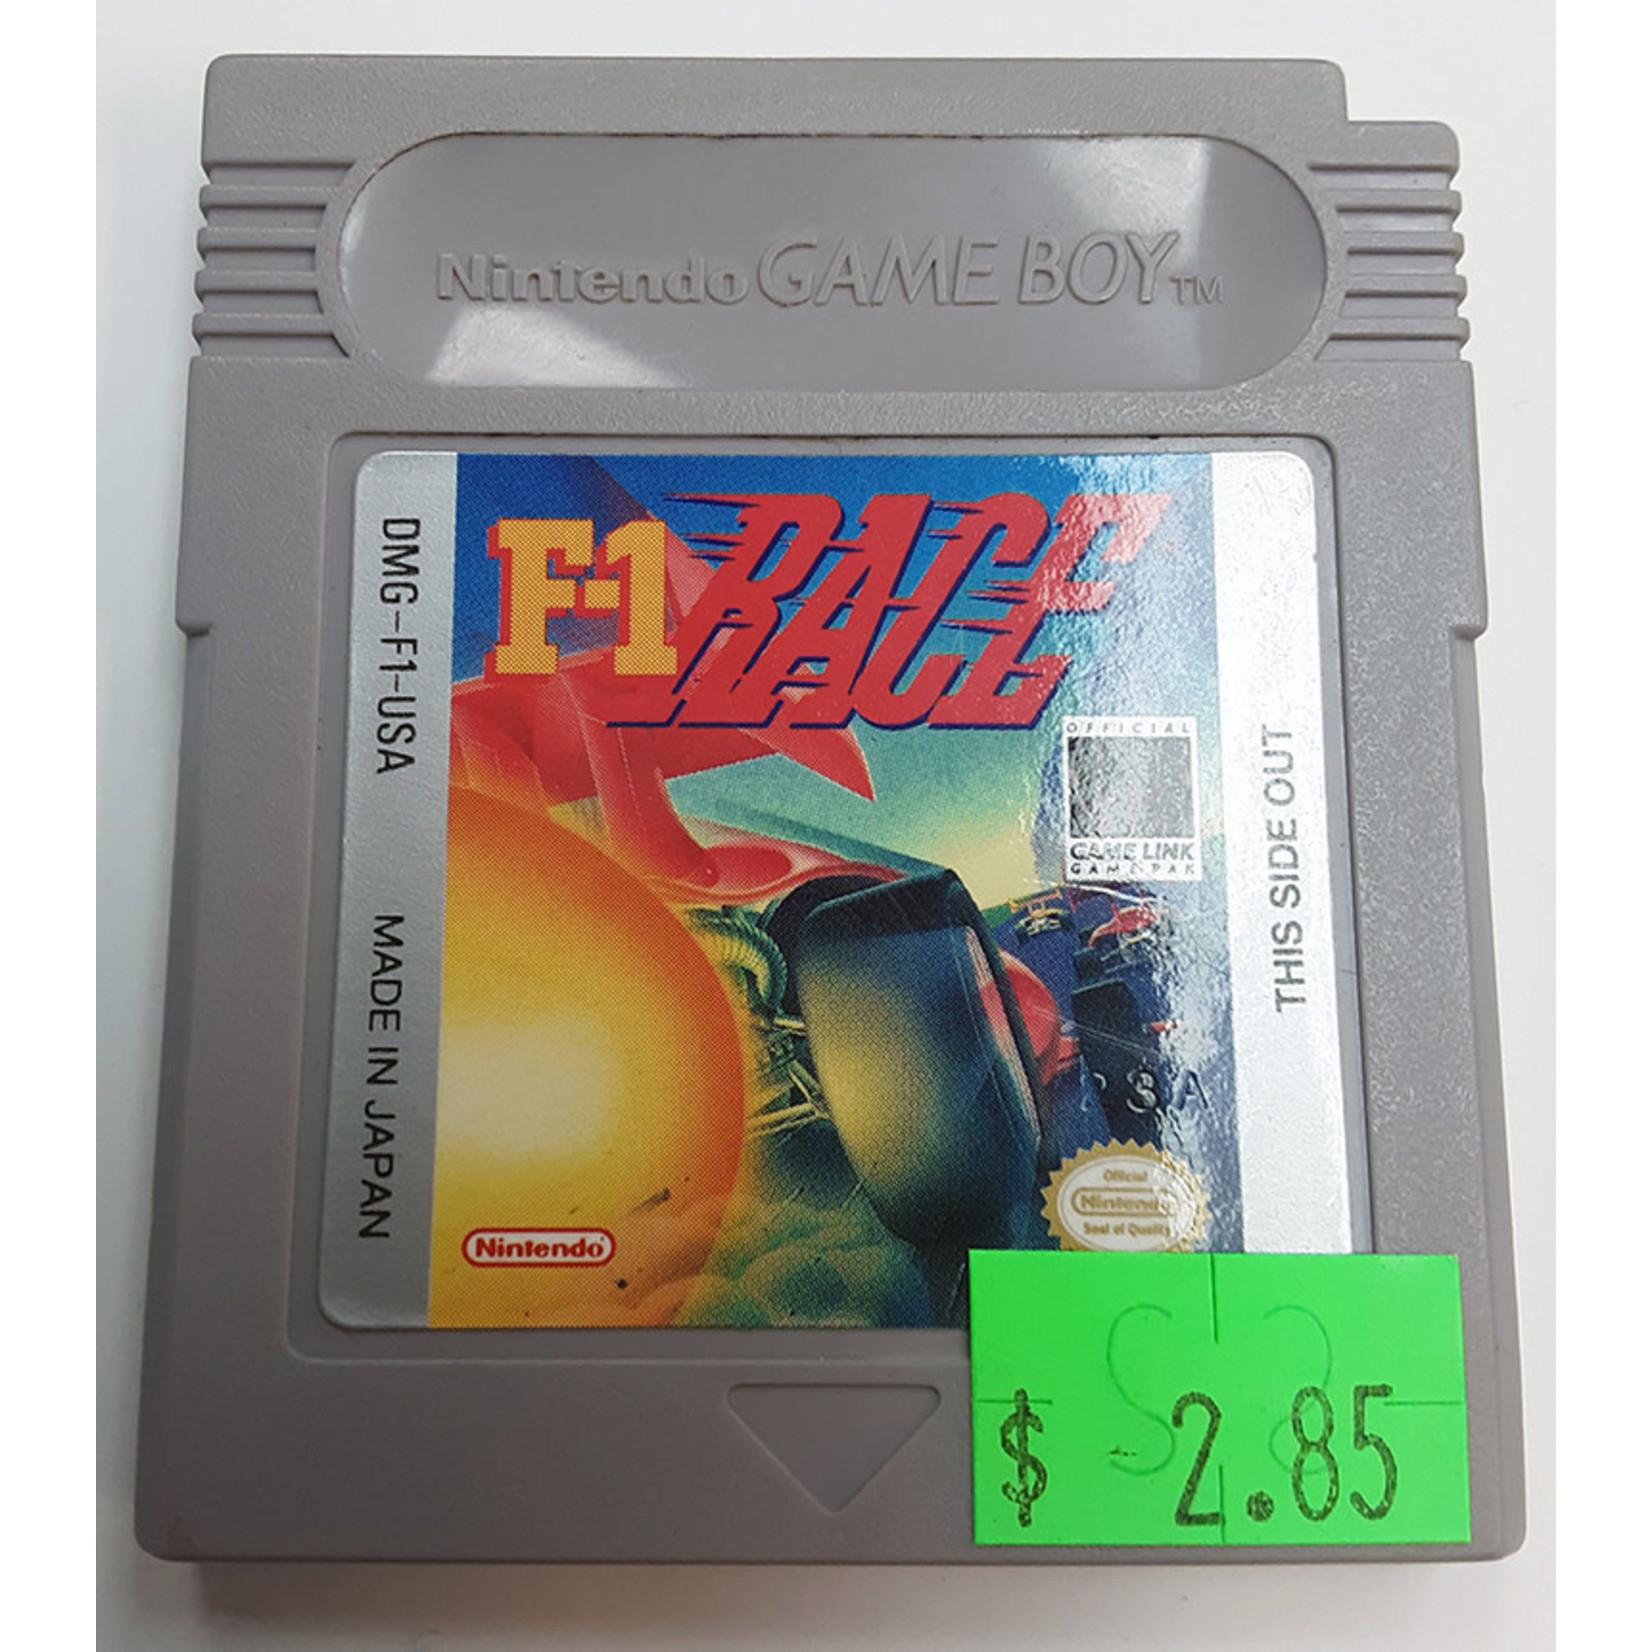 GBu-F-1 Race (cartridge)